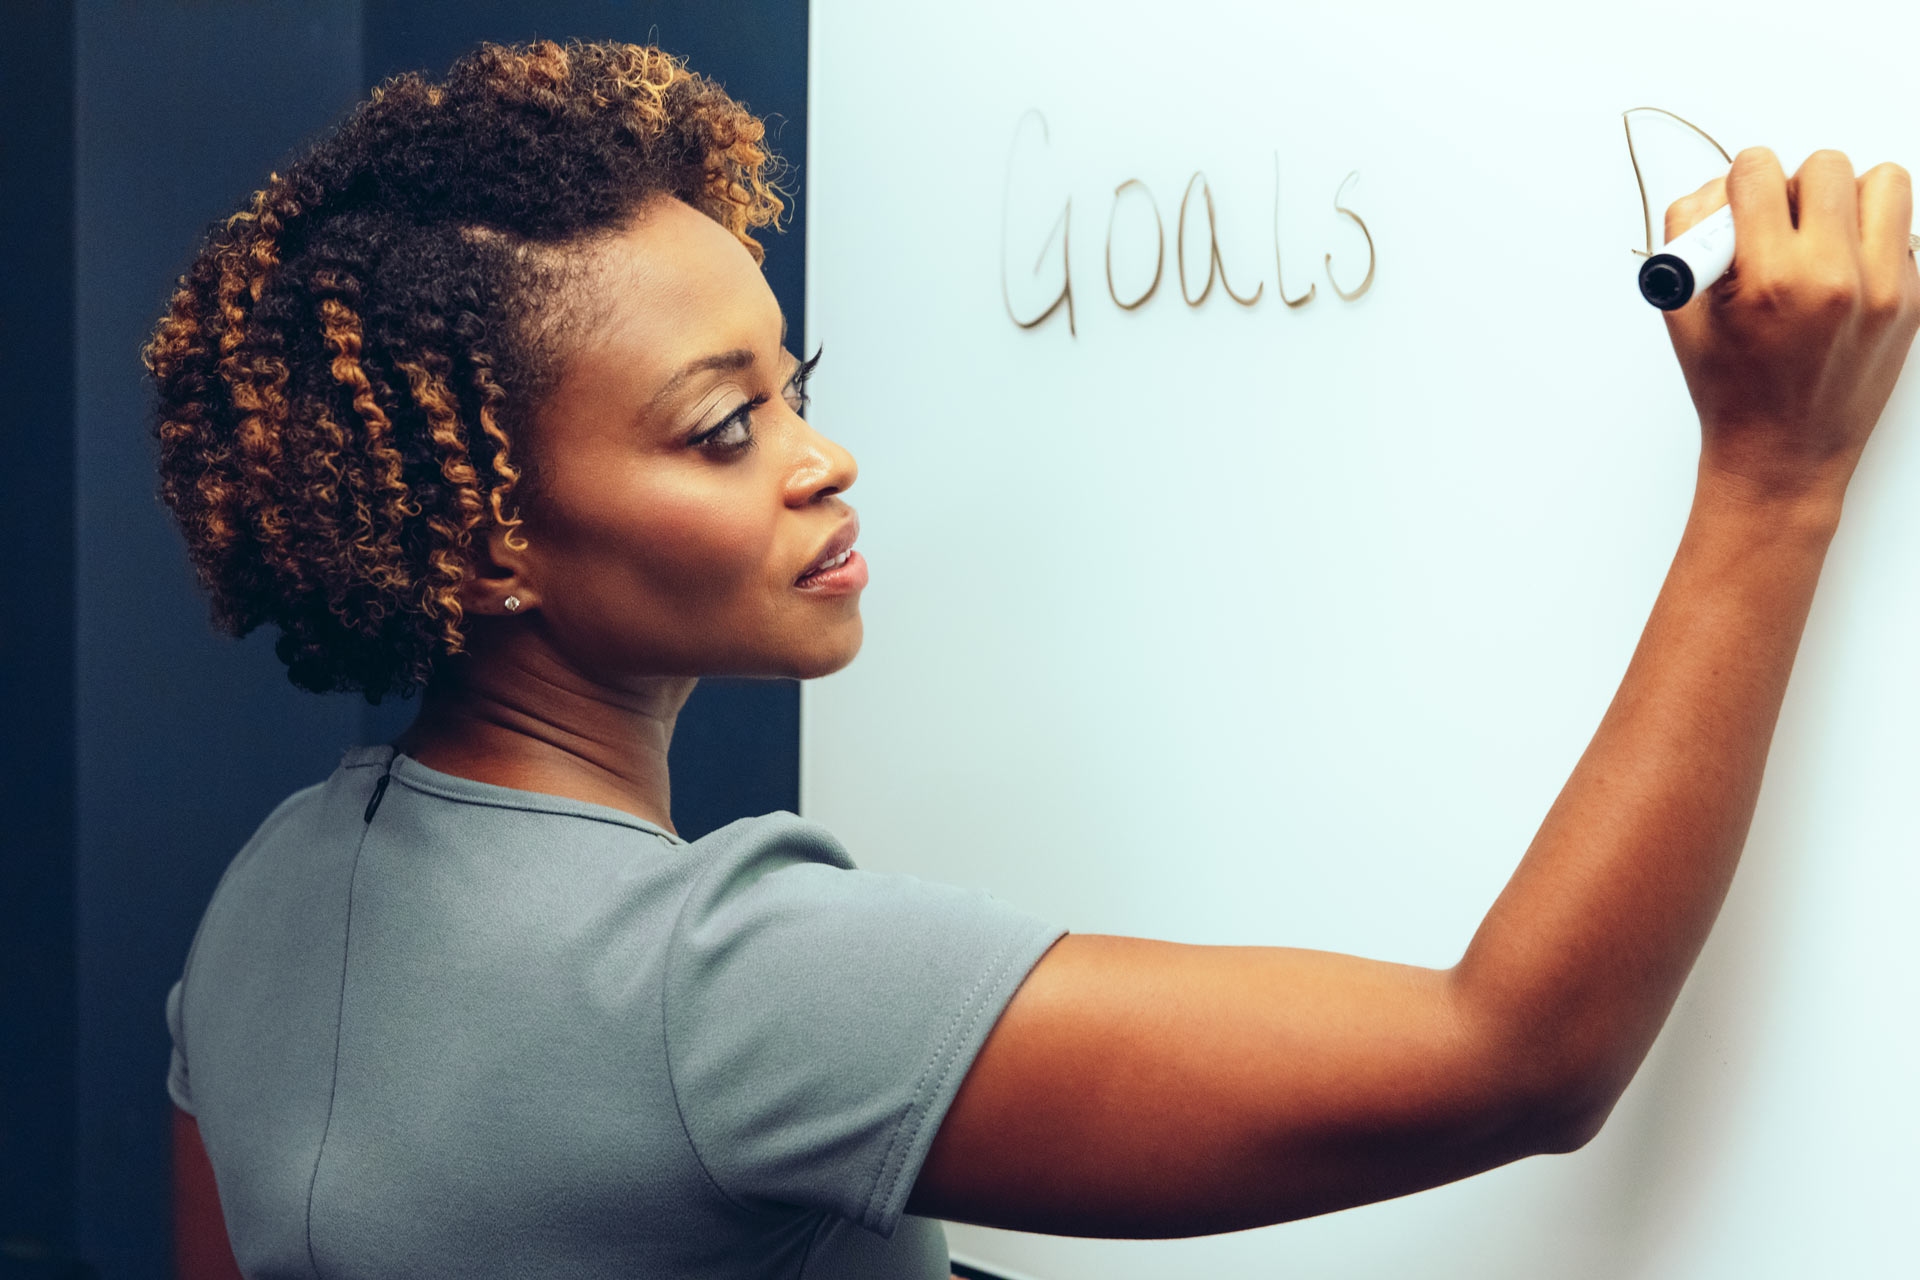 3_Woman-at-Whiteboard